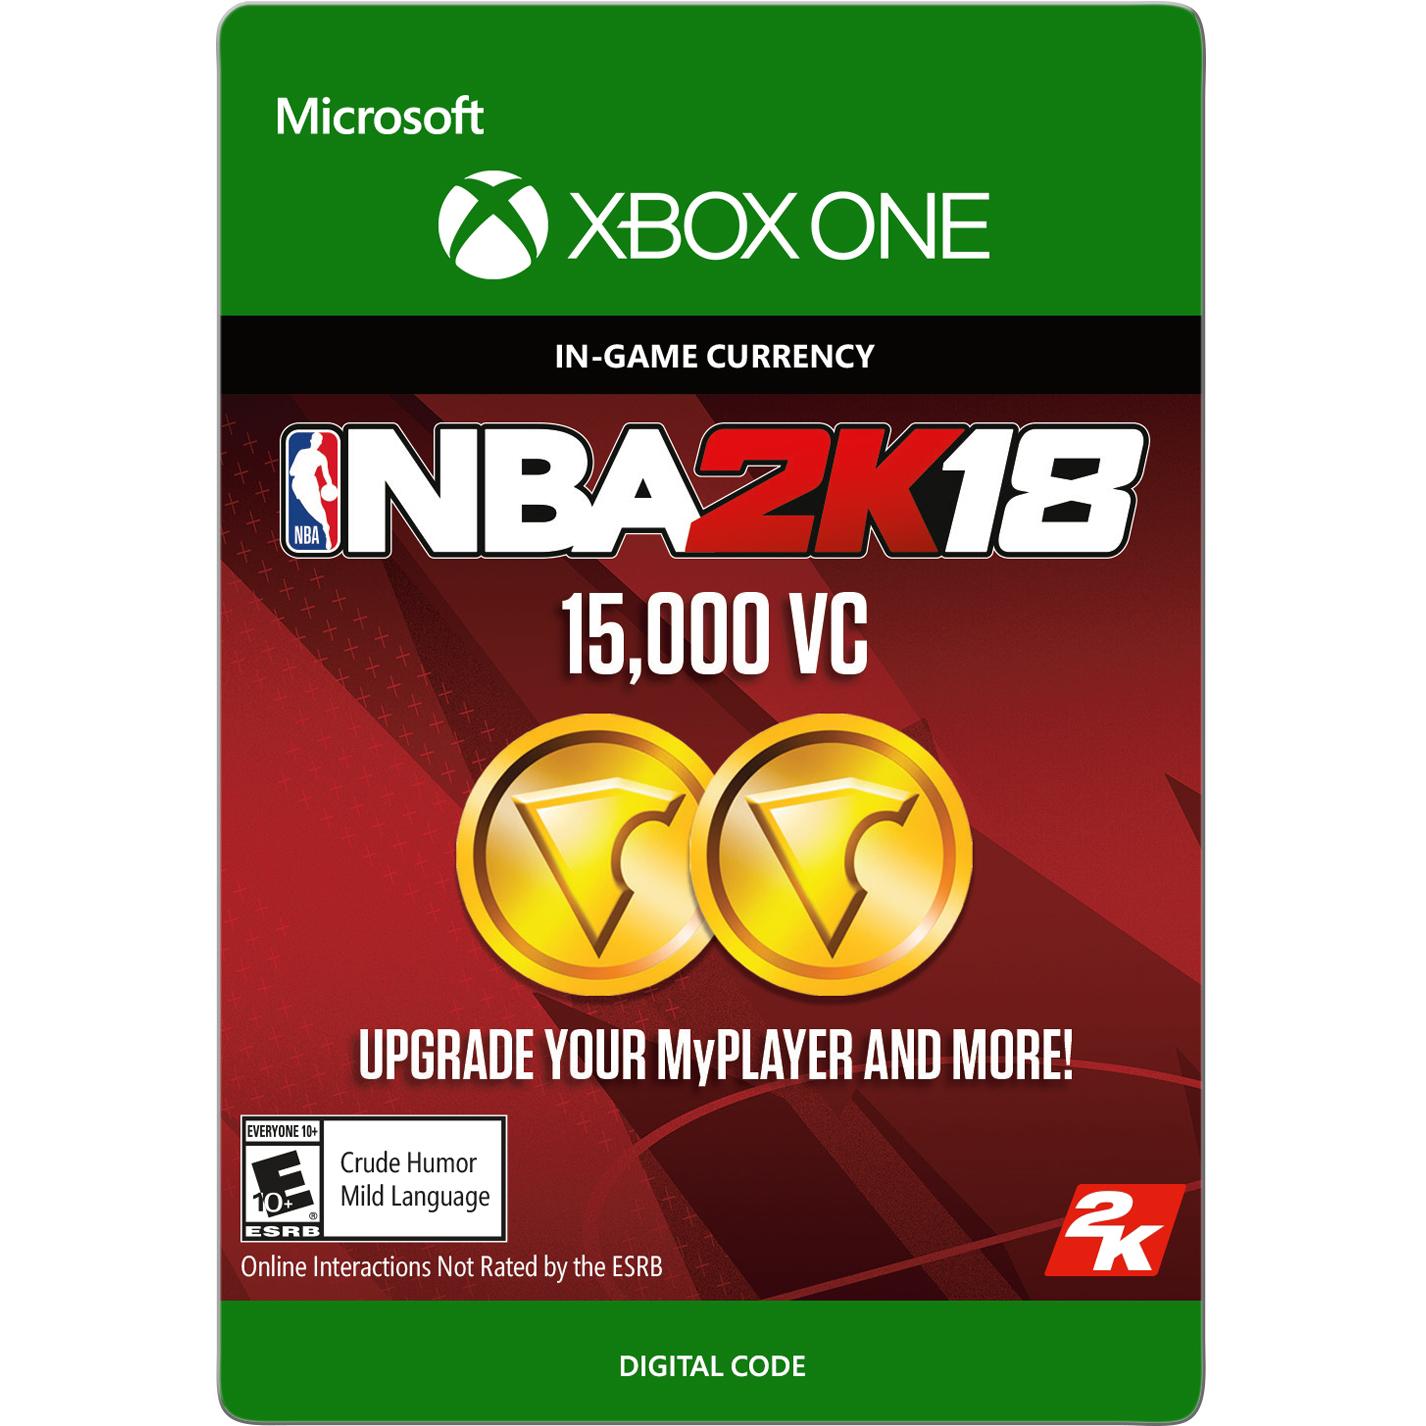 NBA 2K18 15,000 VC (Digital Download), 2K, Xbox One, 799366475873